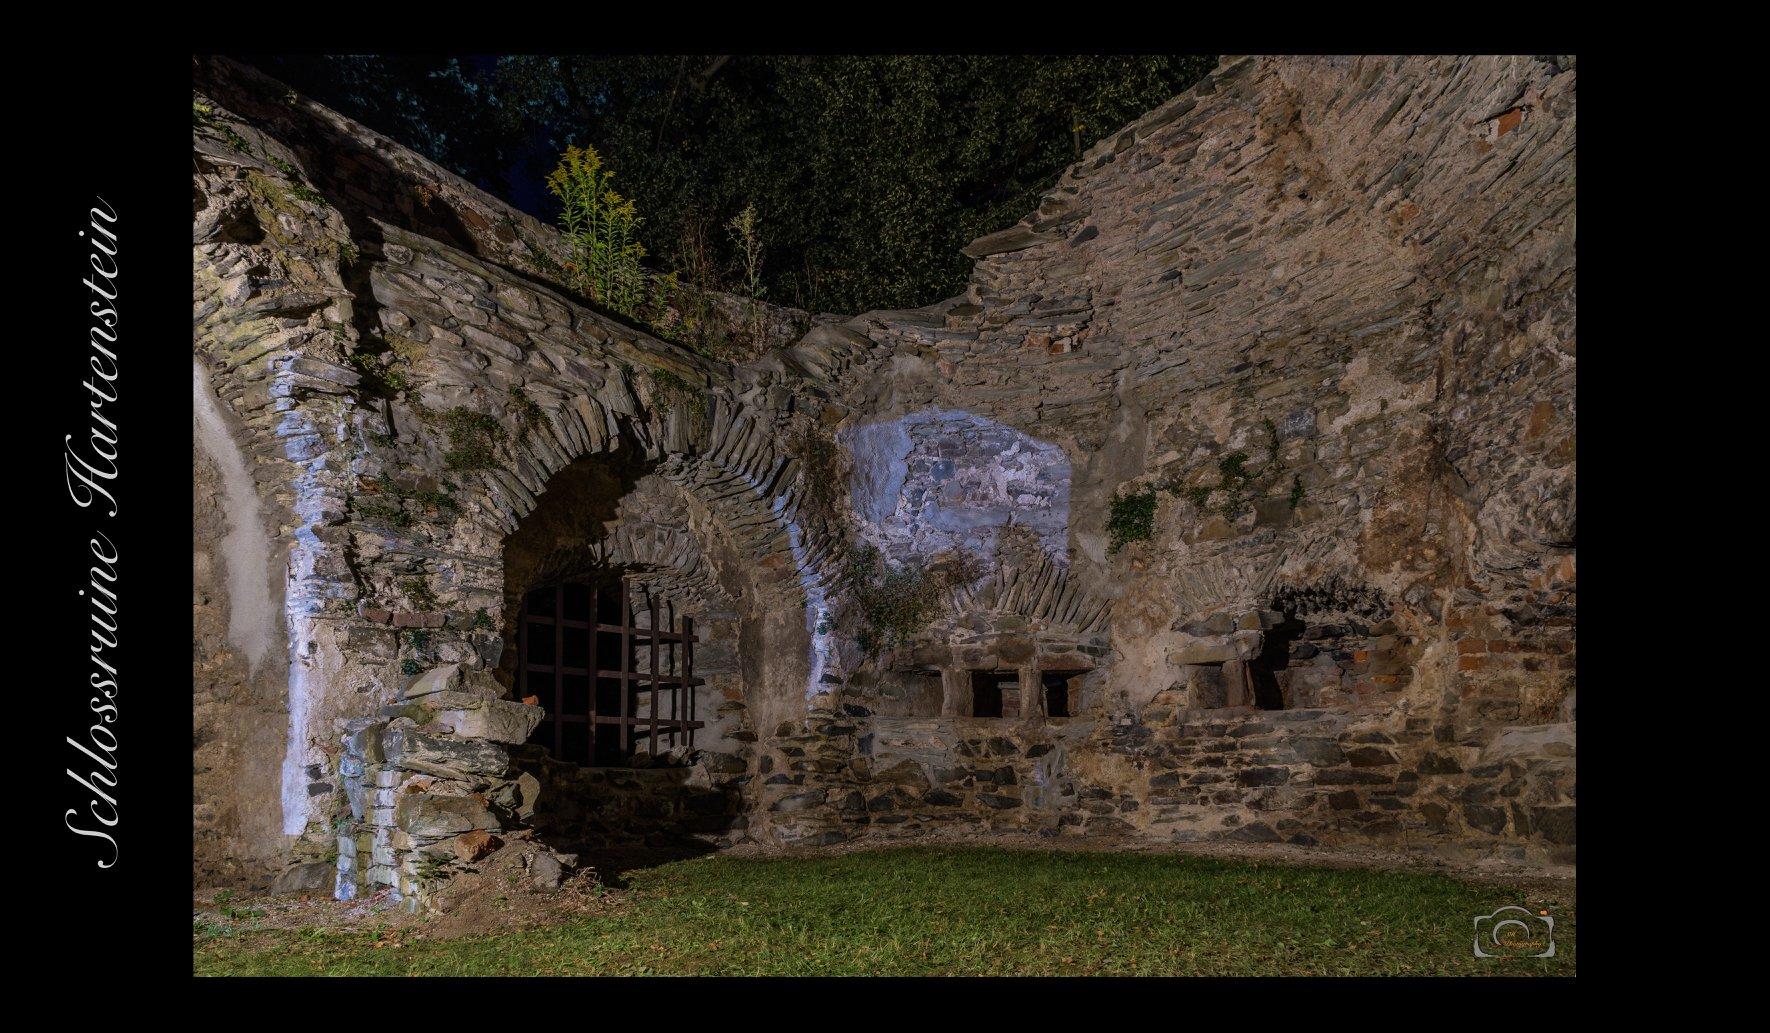 Hartenstein castle ruins, Germany